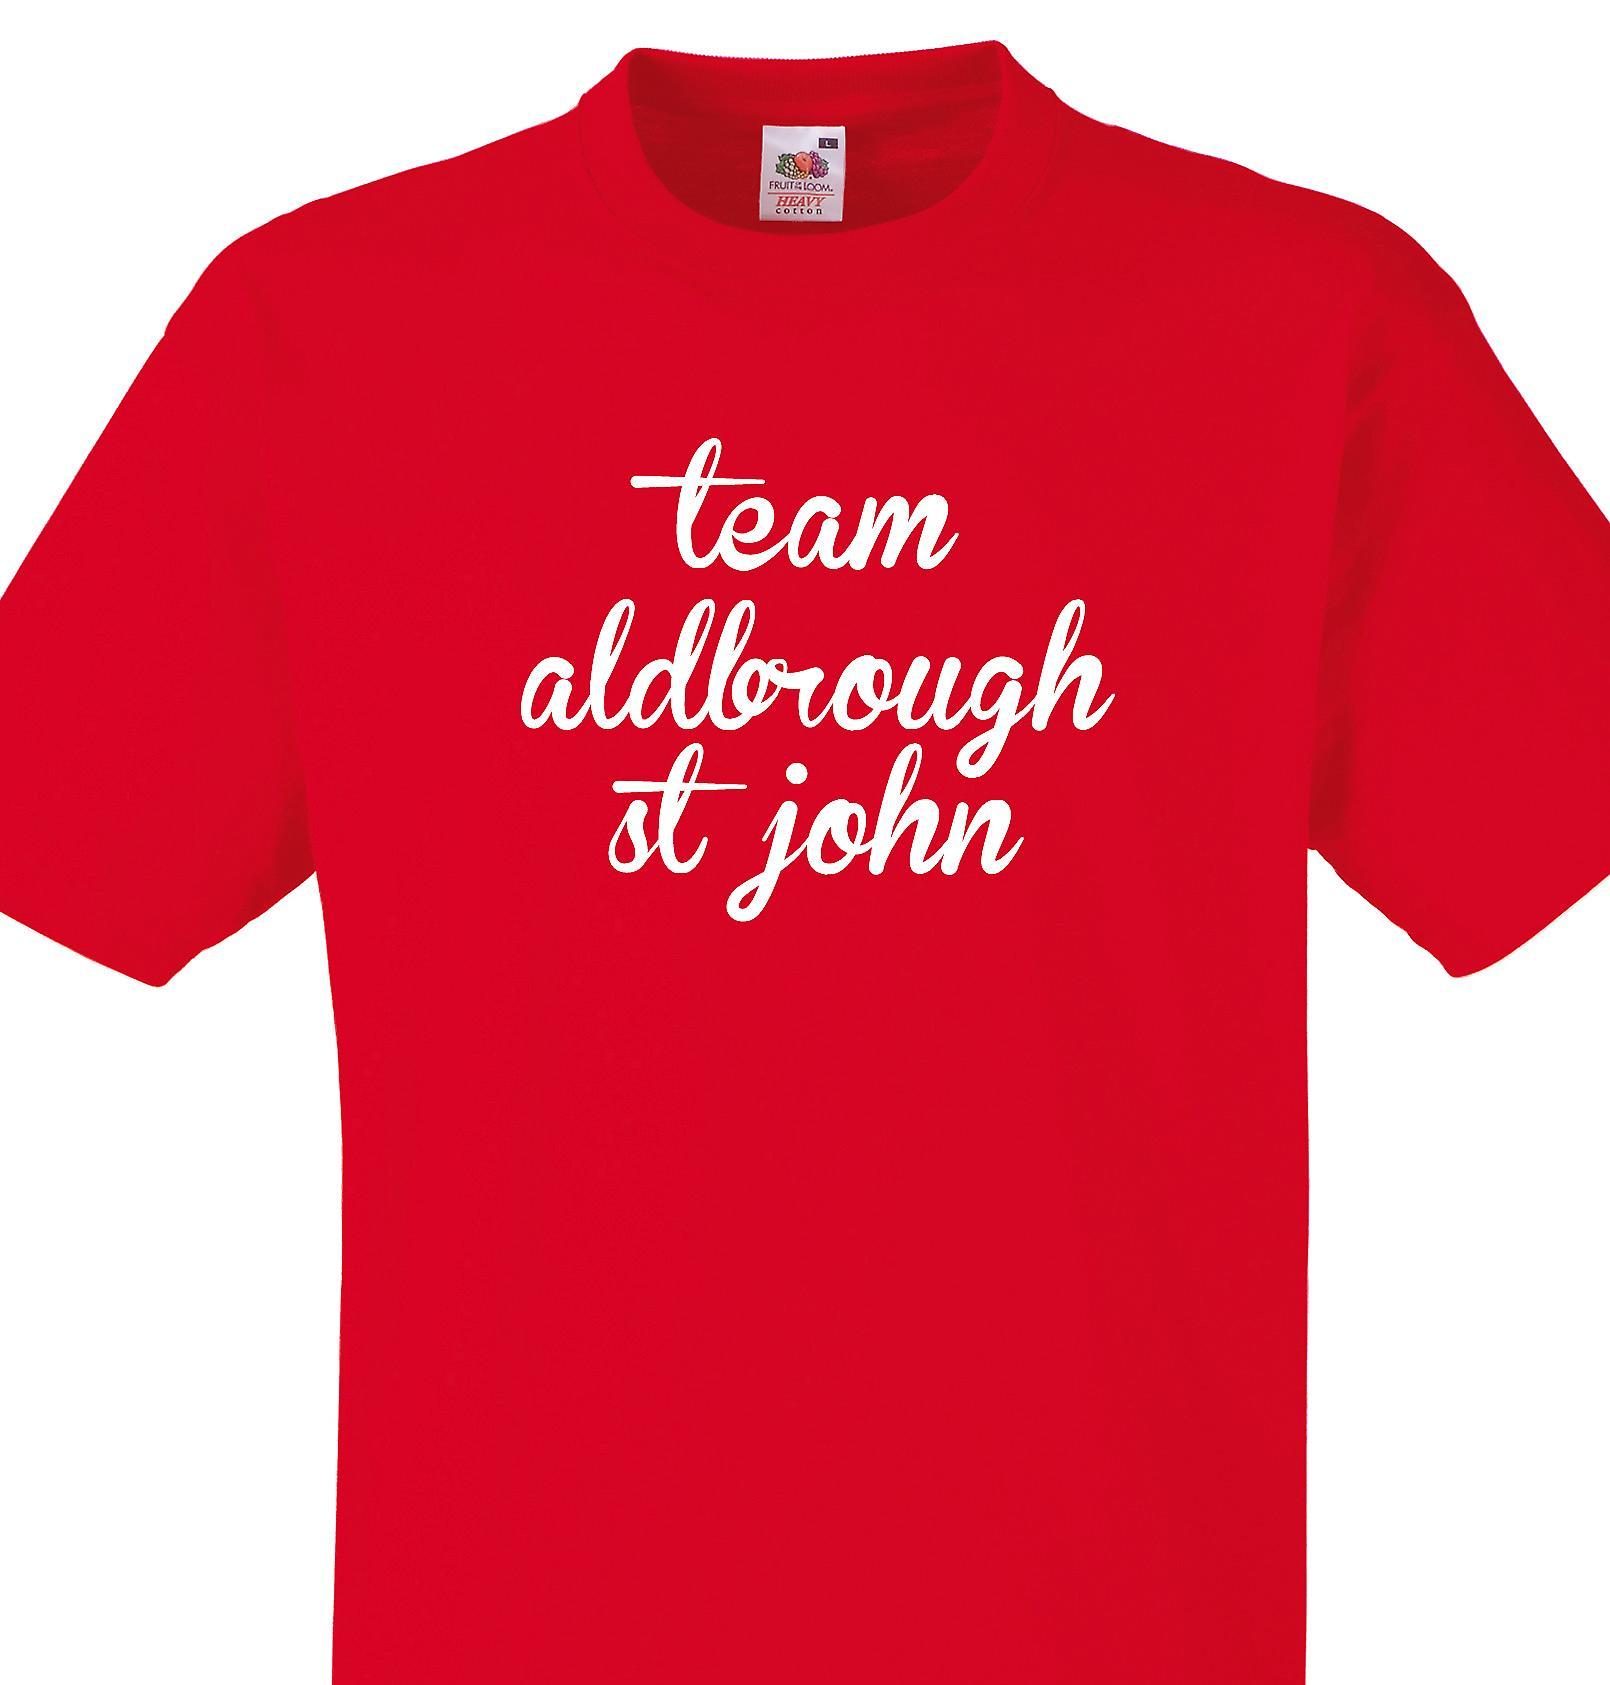 Team Aldbrough st john Red T shirt